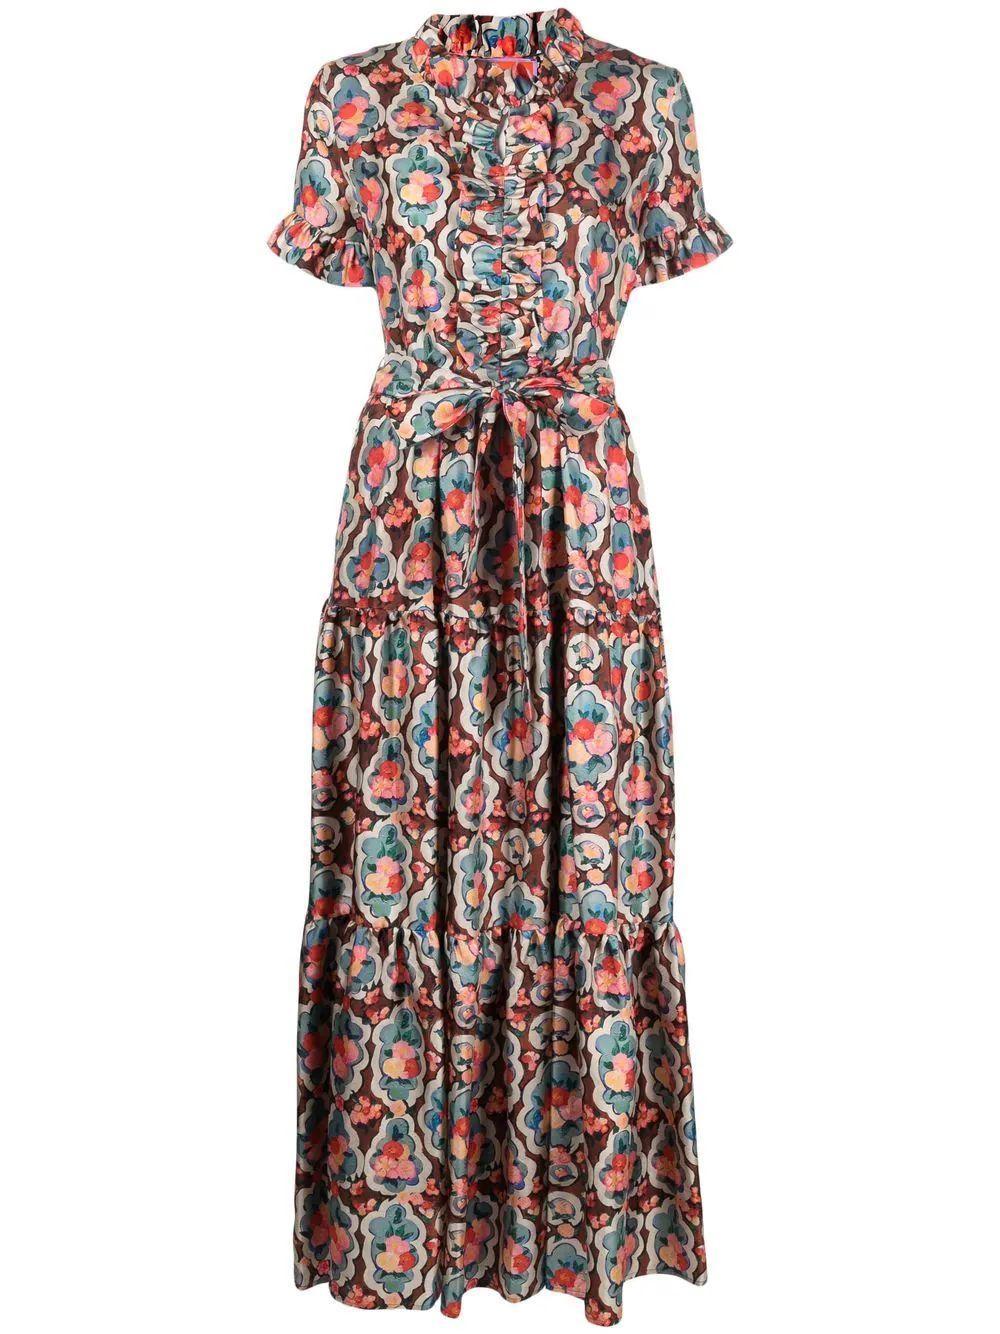 Long And Sassy Dress Item # DRE0017-SIL001